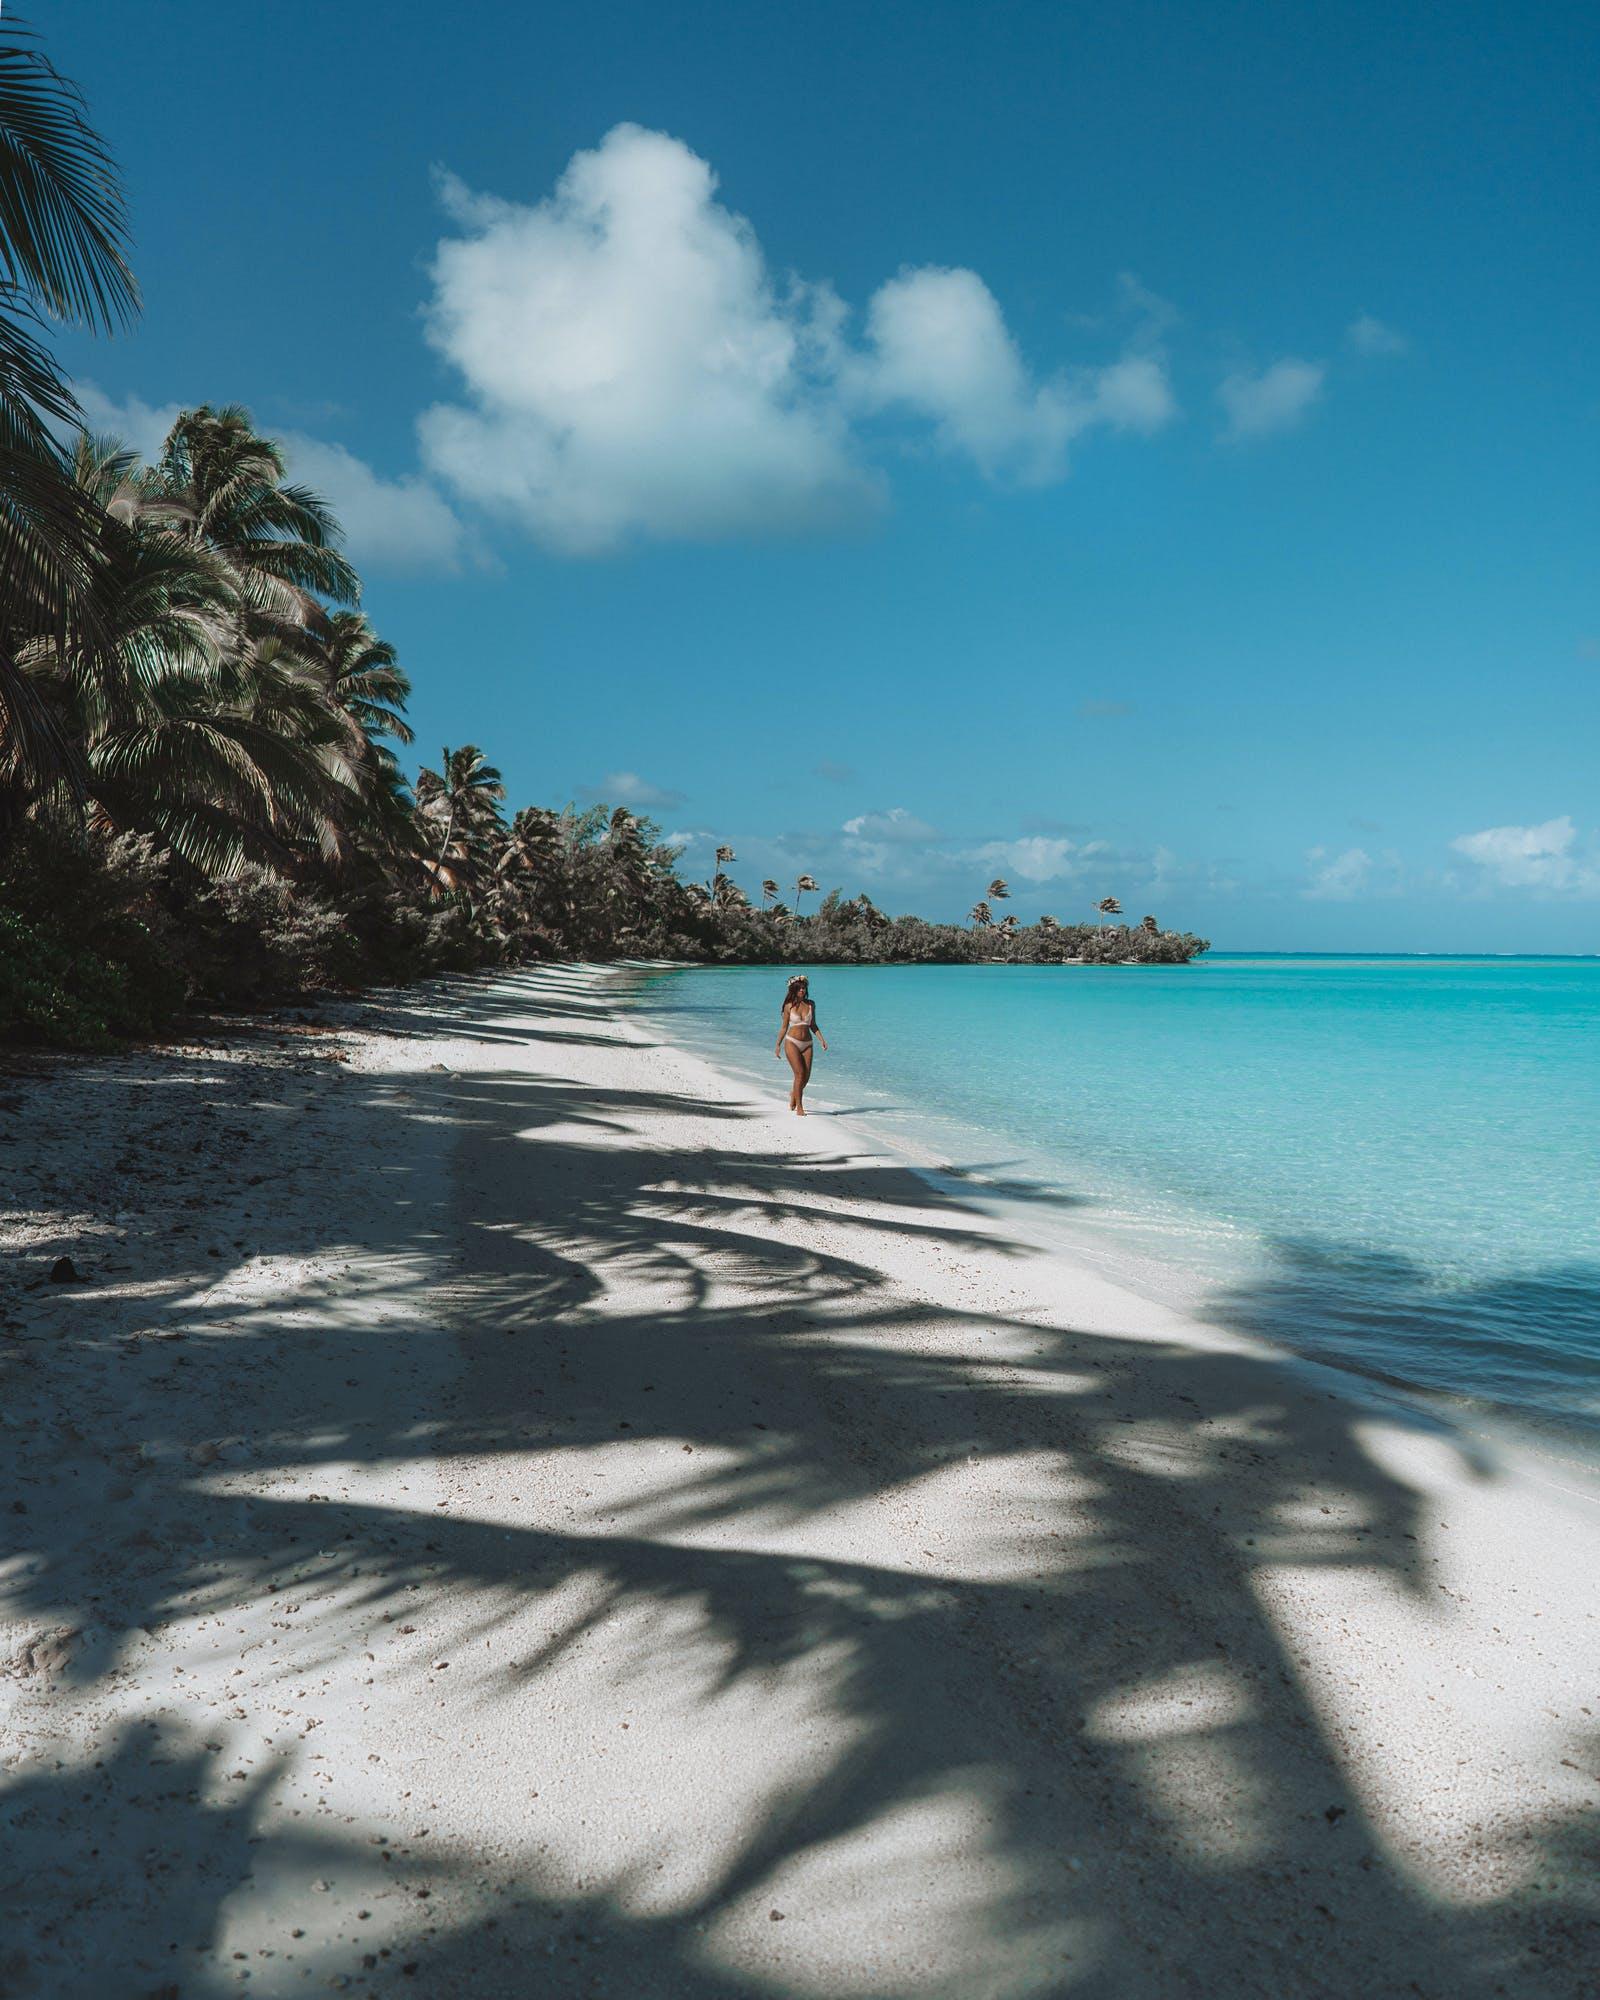 Cook Islands Beaches: The Aitutaki, Cook Islands Travel Guide